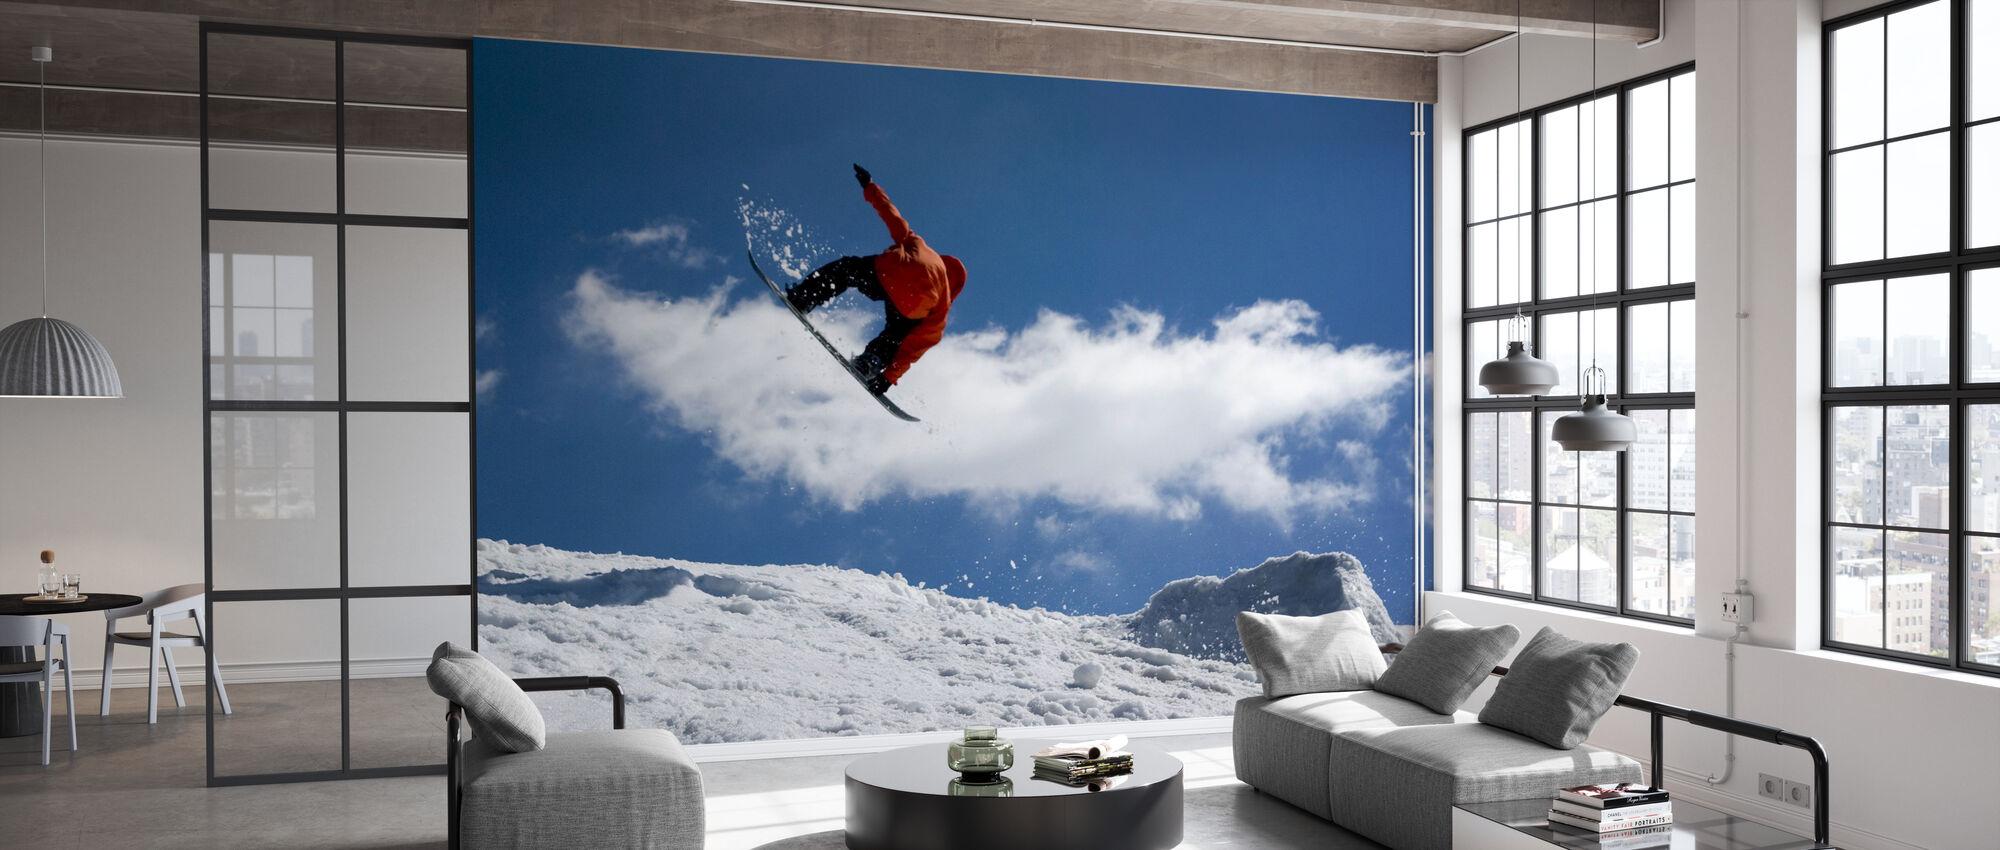 Snowboard Jump from Ramp - Wallpaper - Office